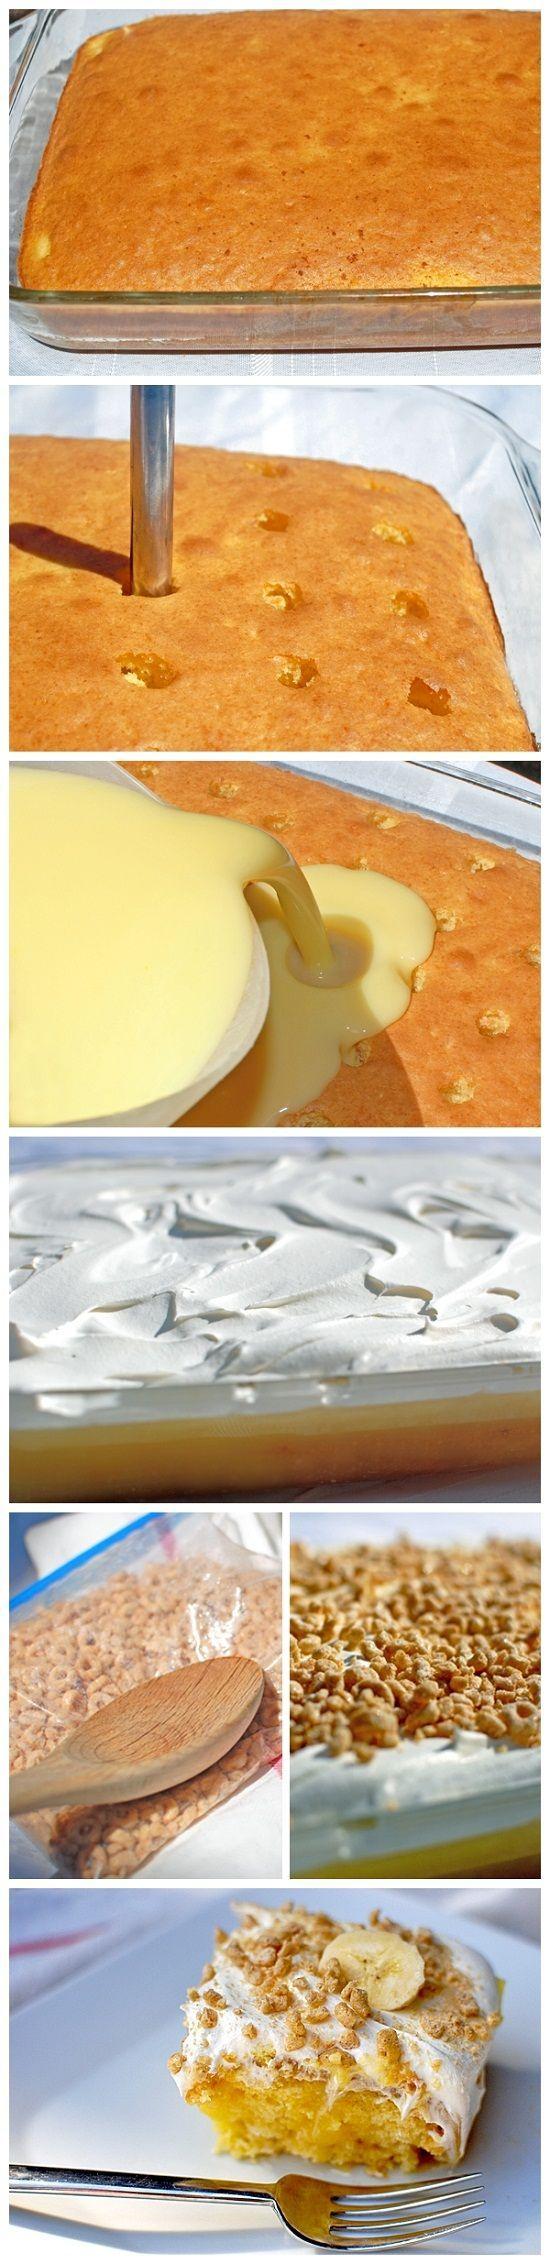 Banana Pudding Poke Cake: